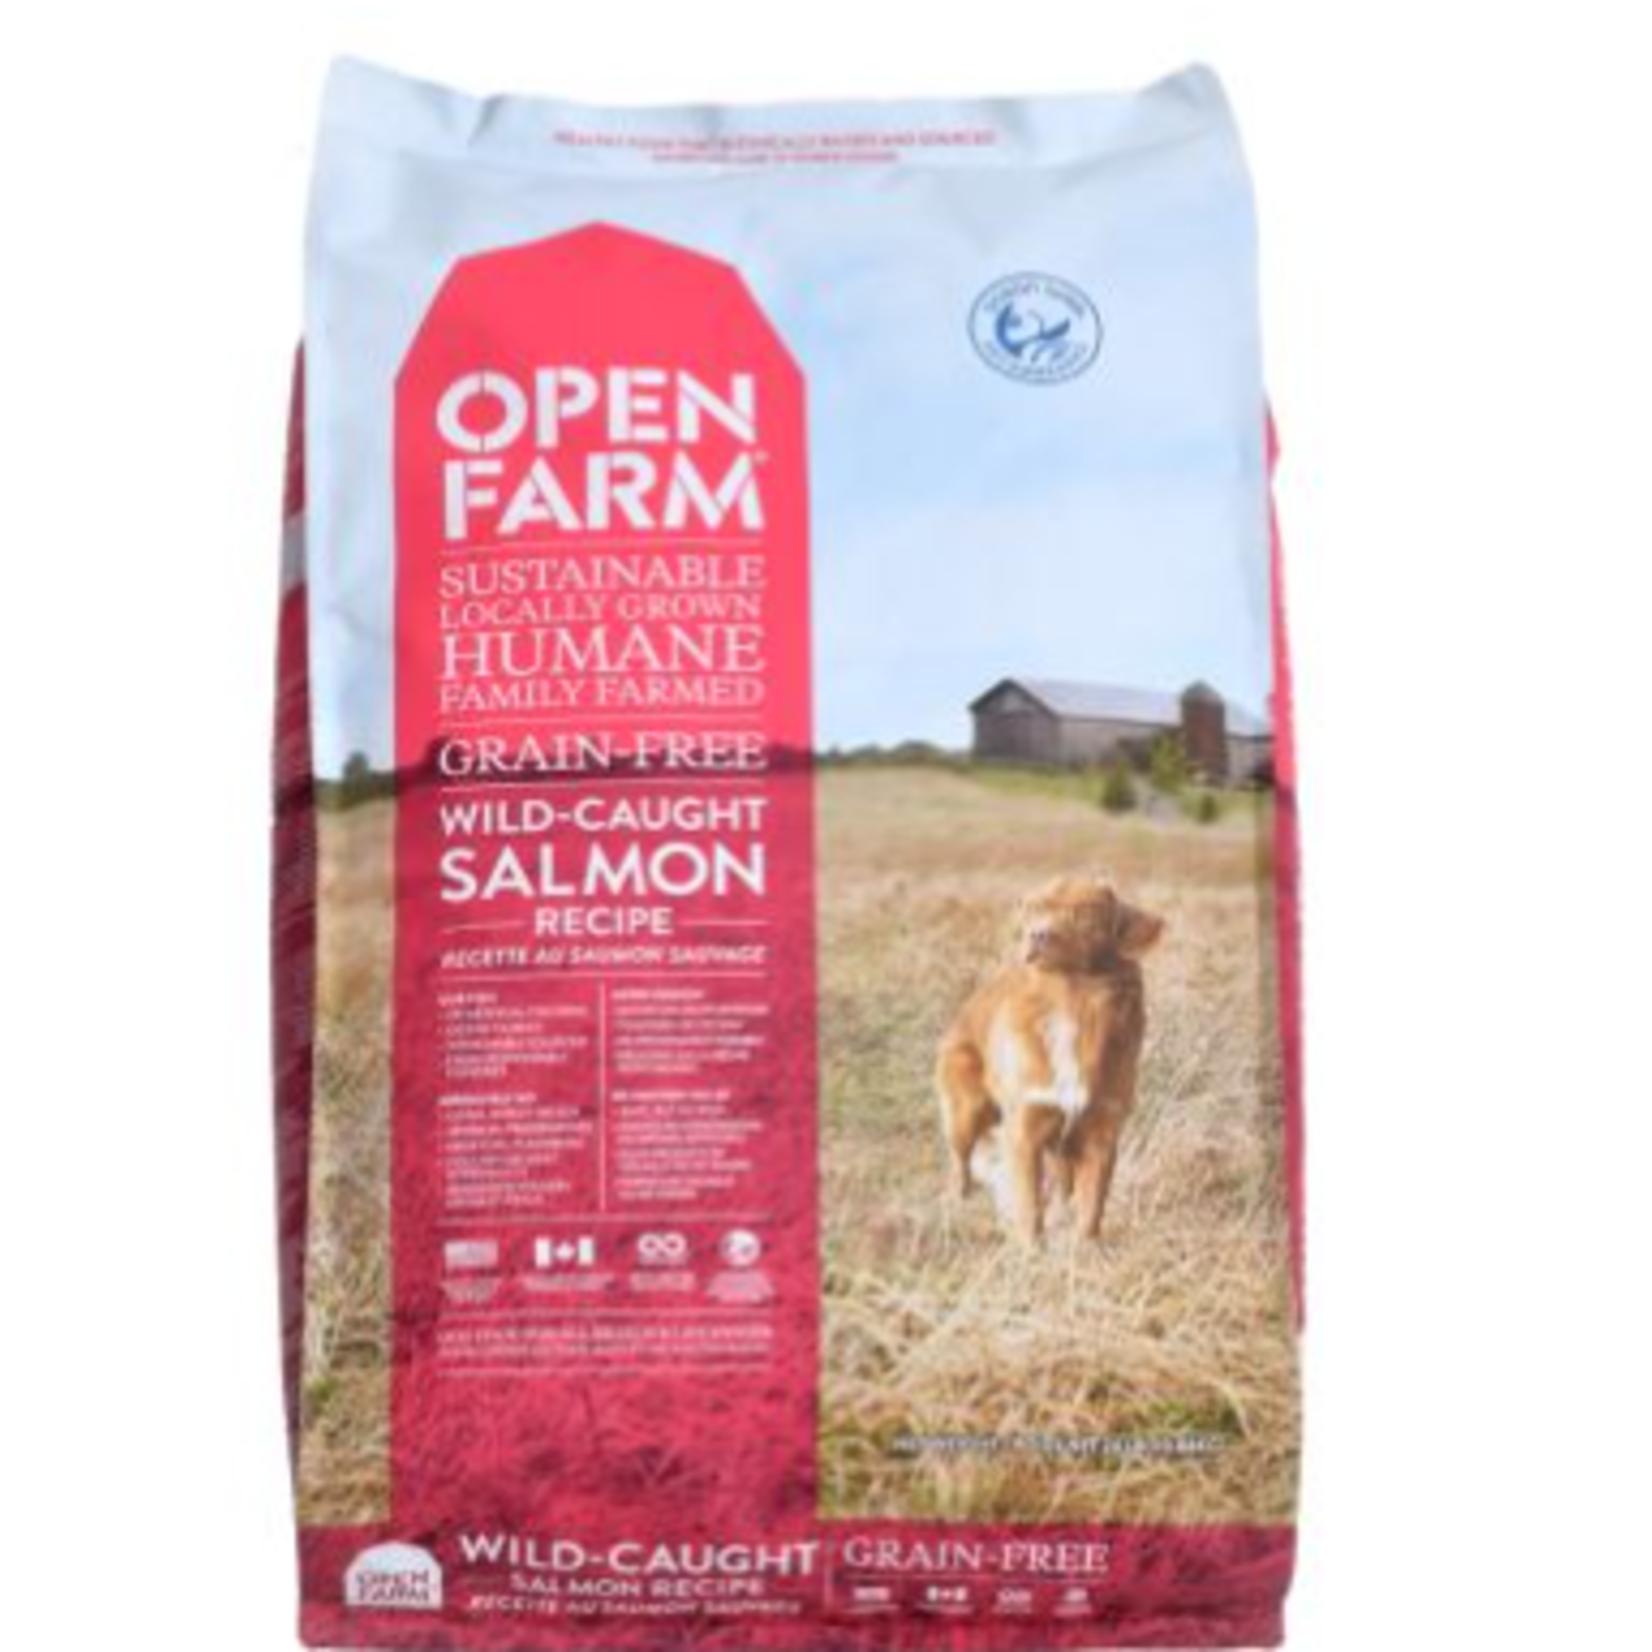 Open Farm Wild-Caught Salmon-dry food-dog